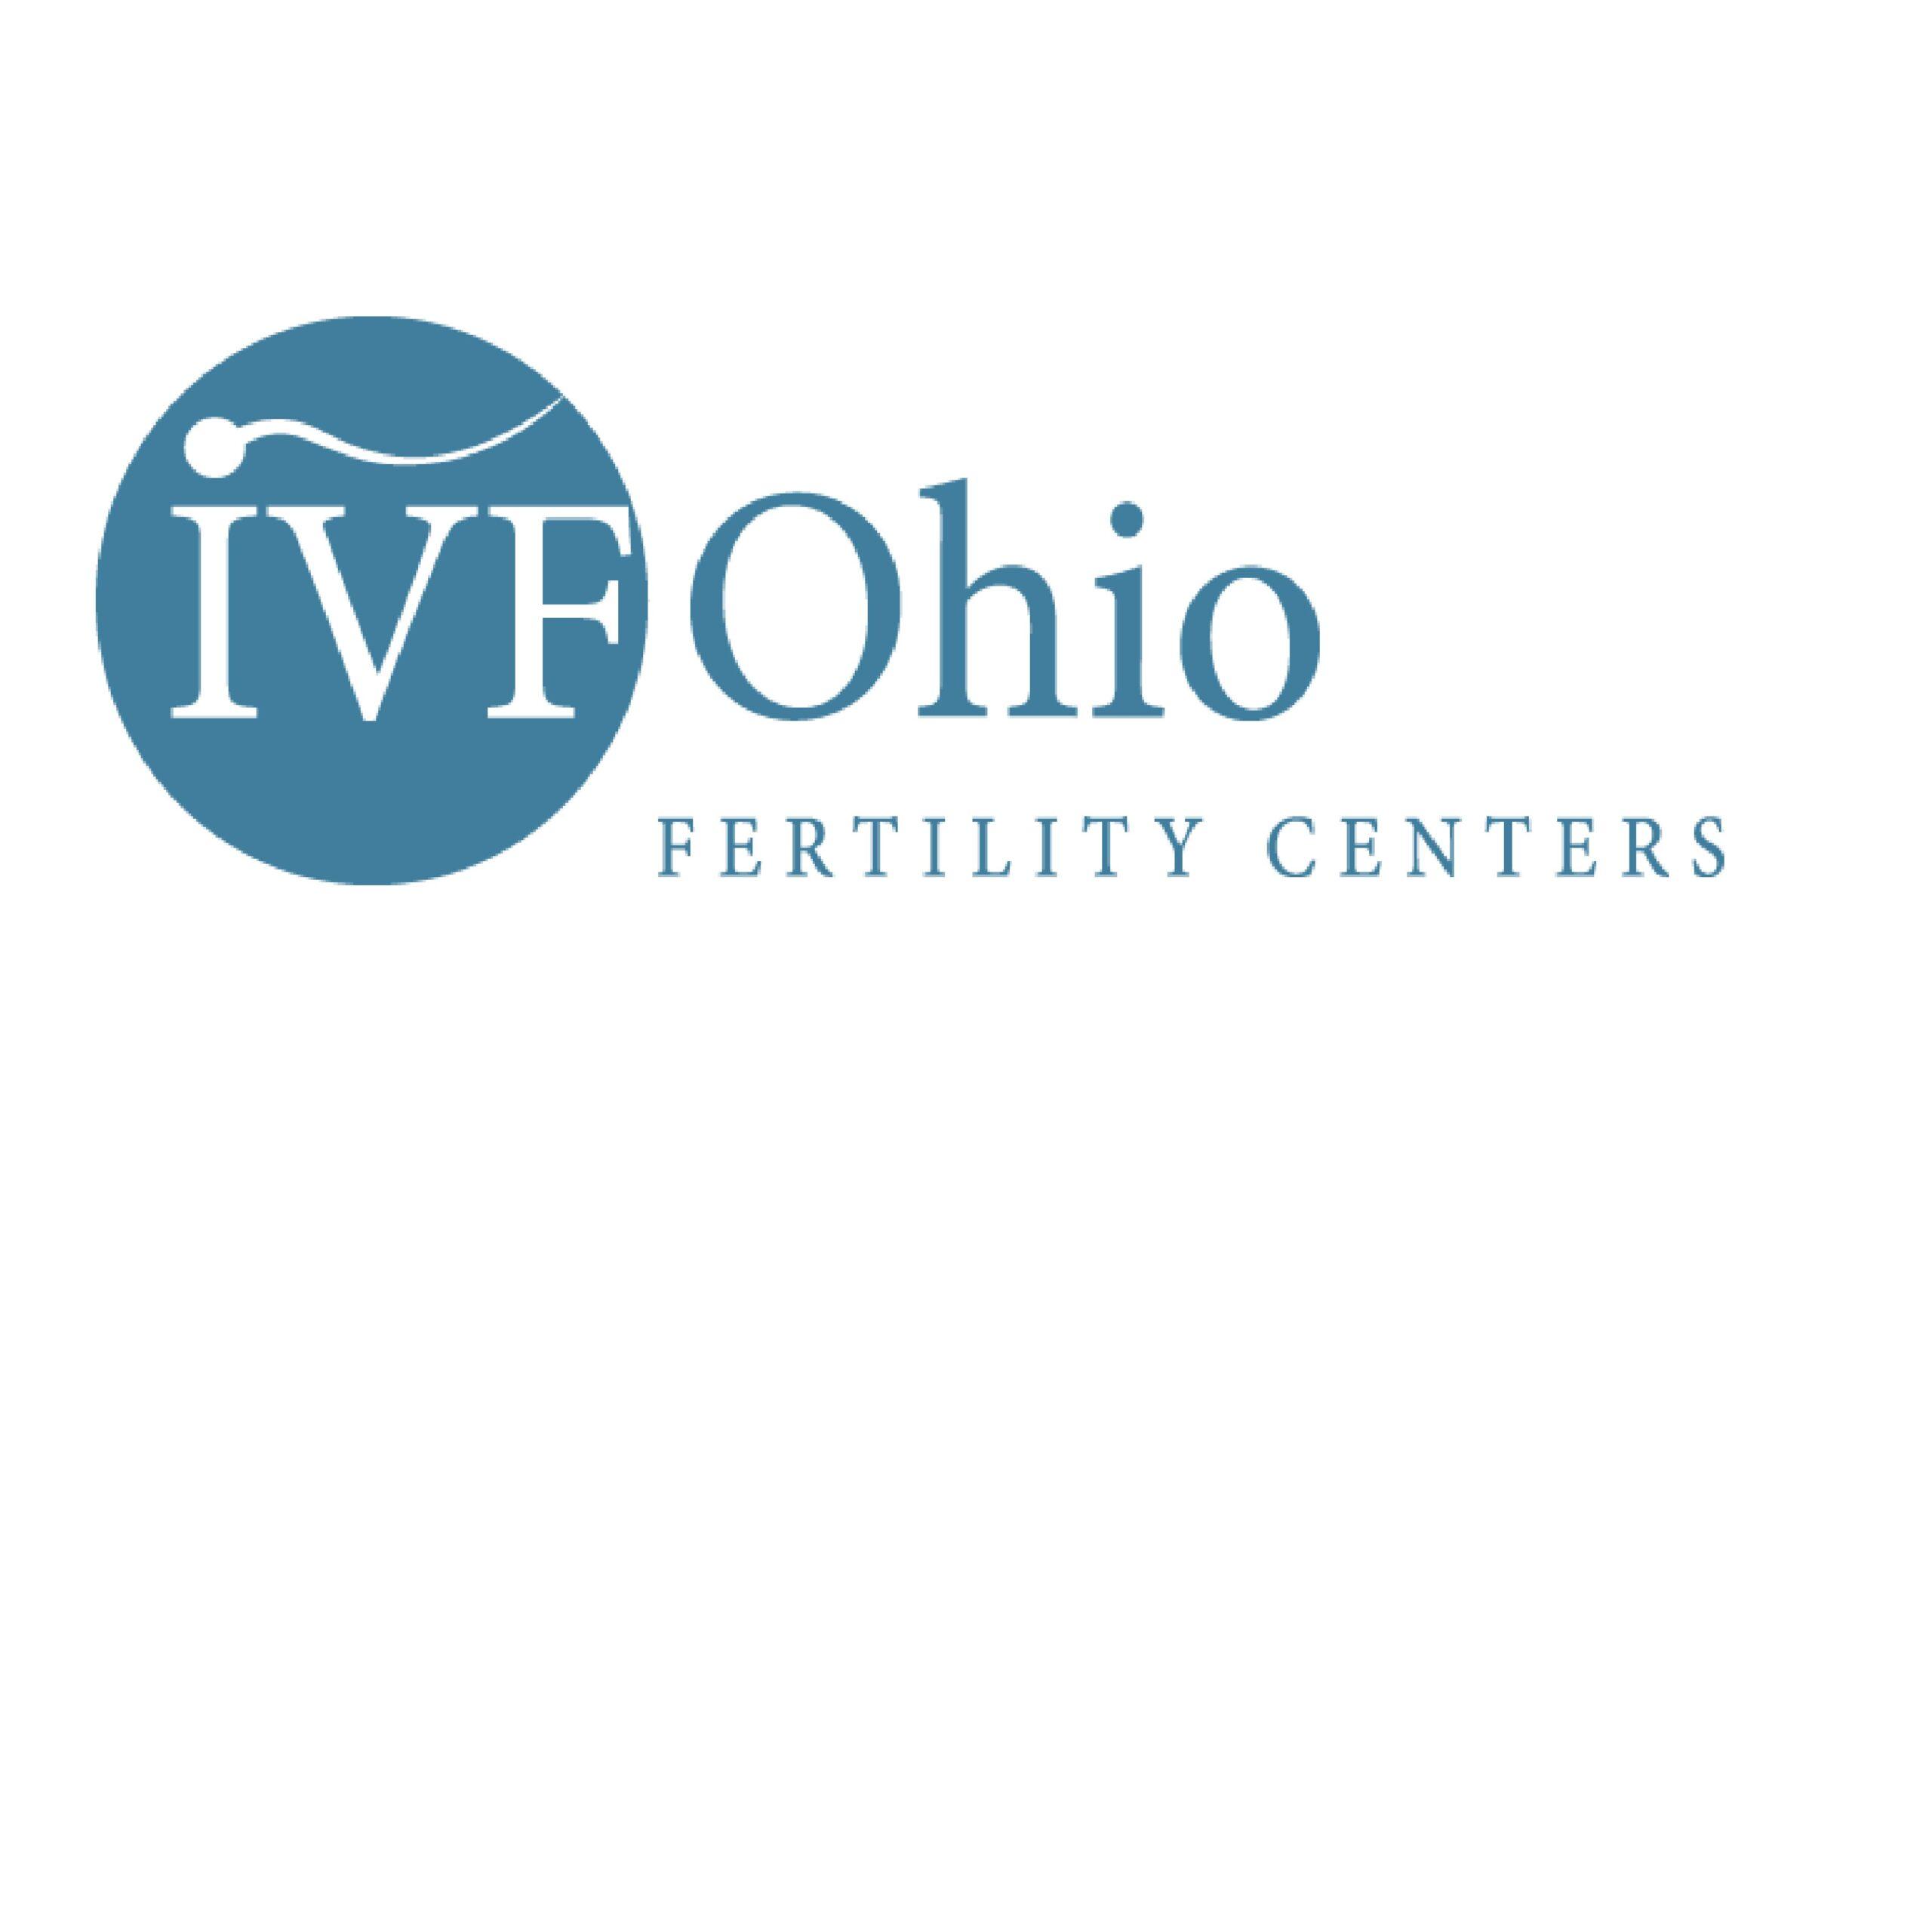 IVF Ohio Fertility Center